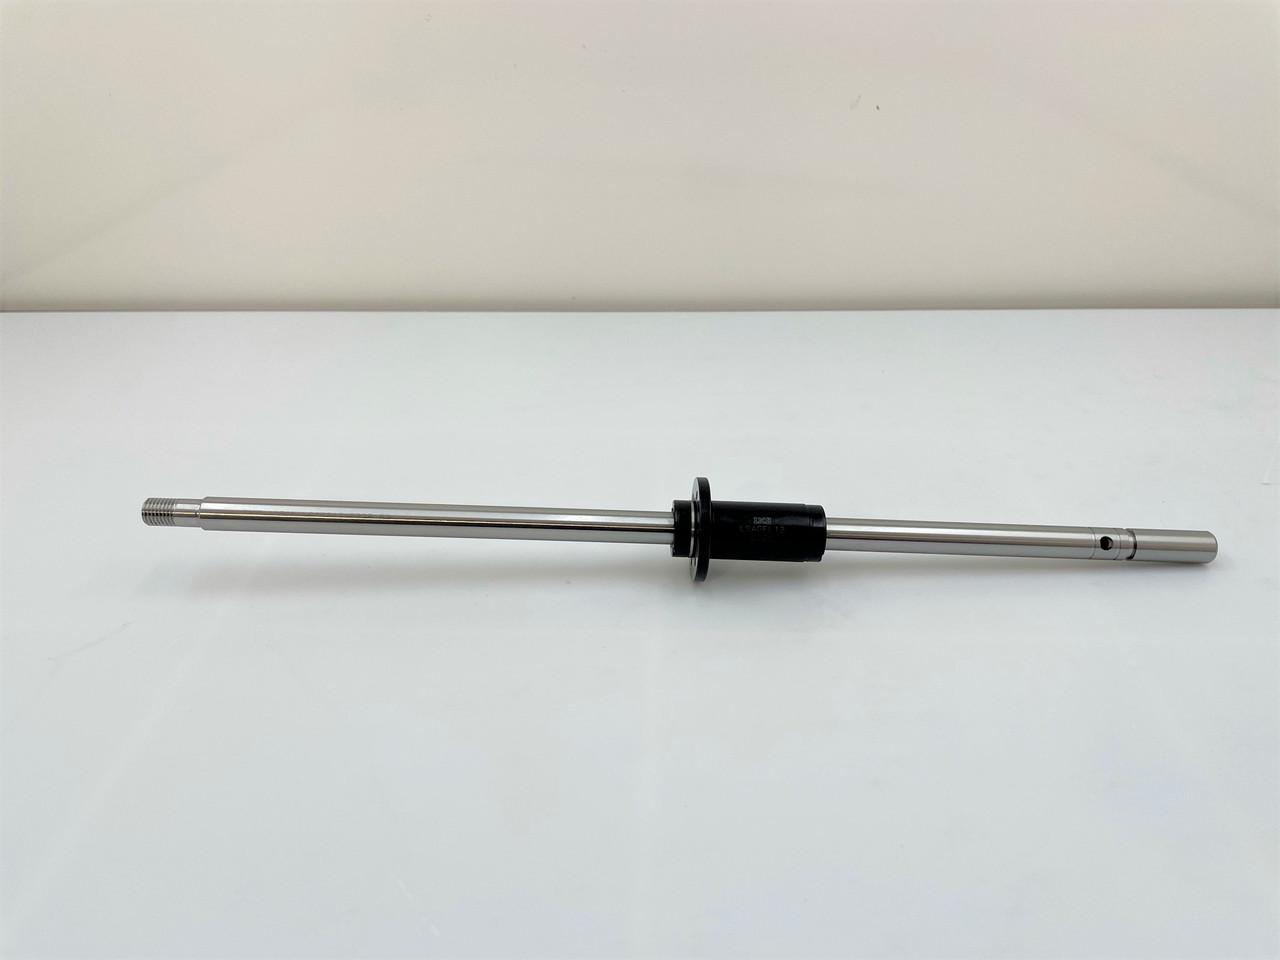 R Axis Ball Spline YK250 YK350 YK400